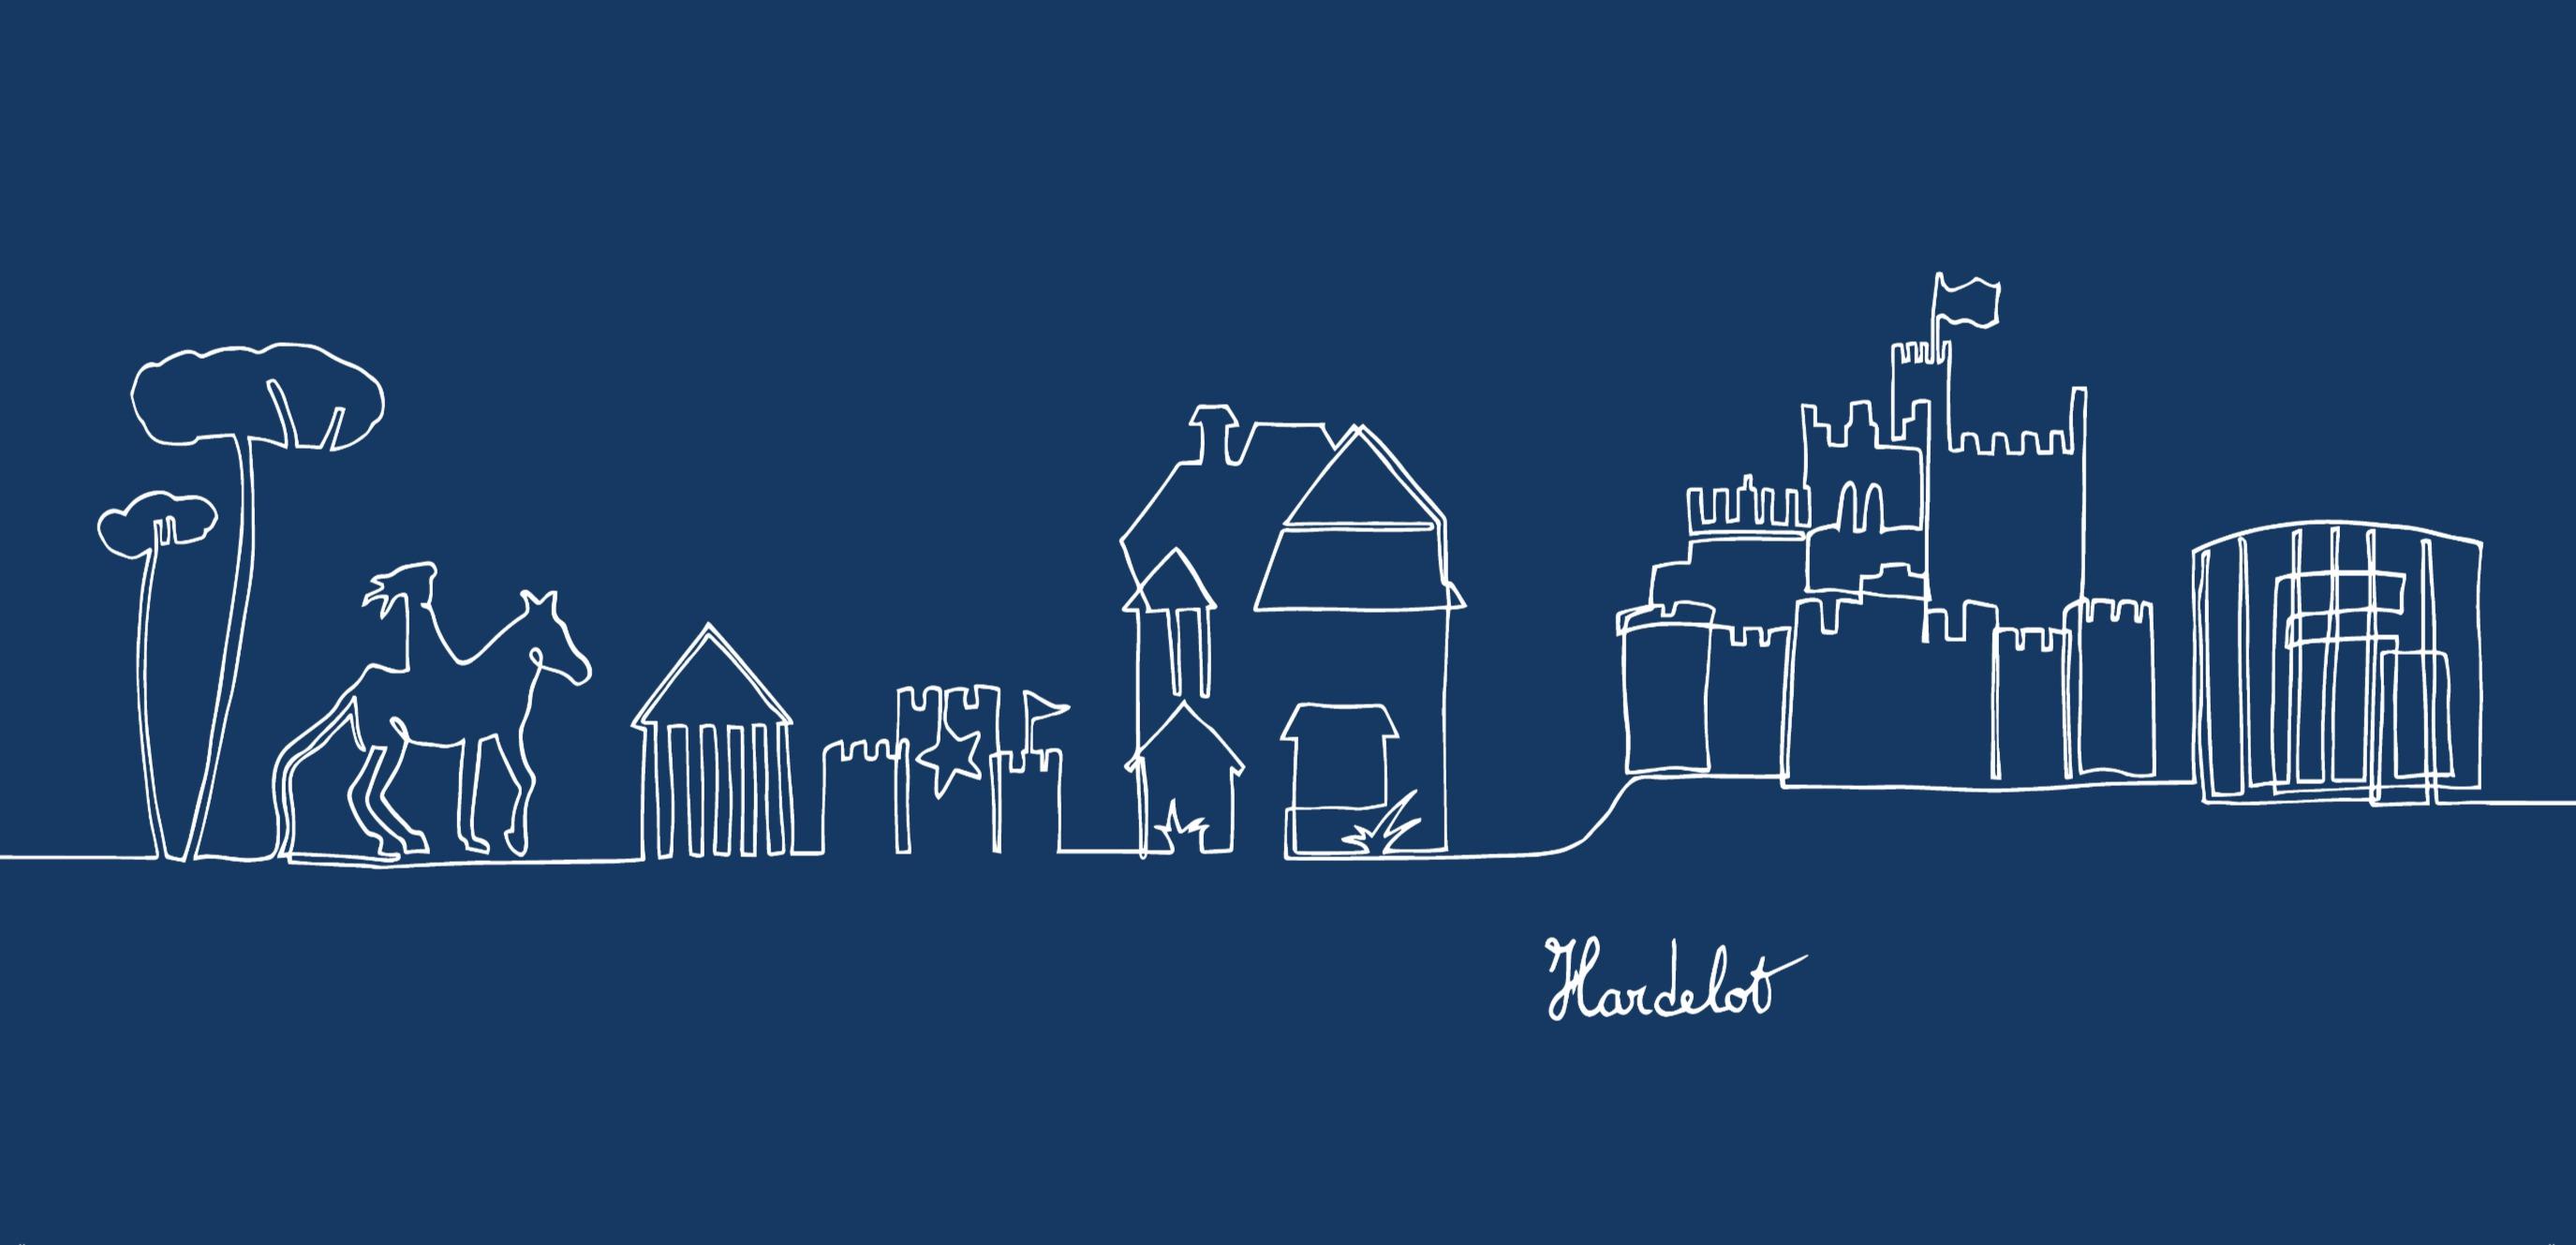 Bleu - Hardelot